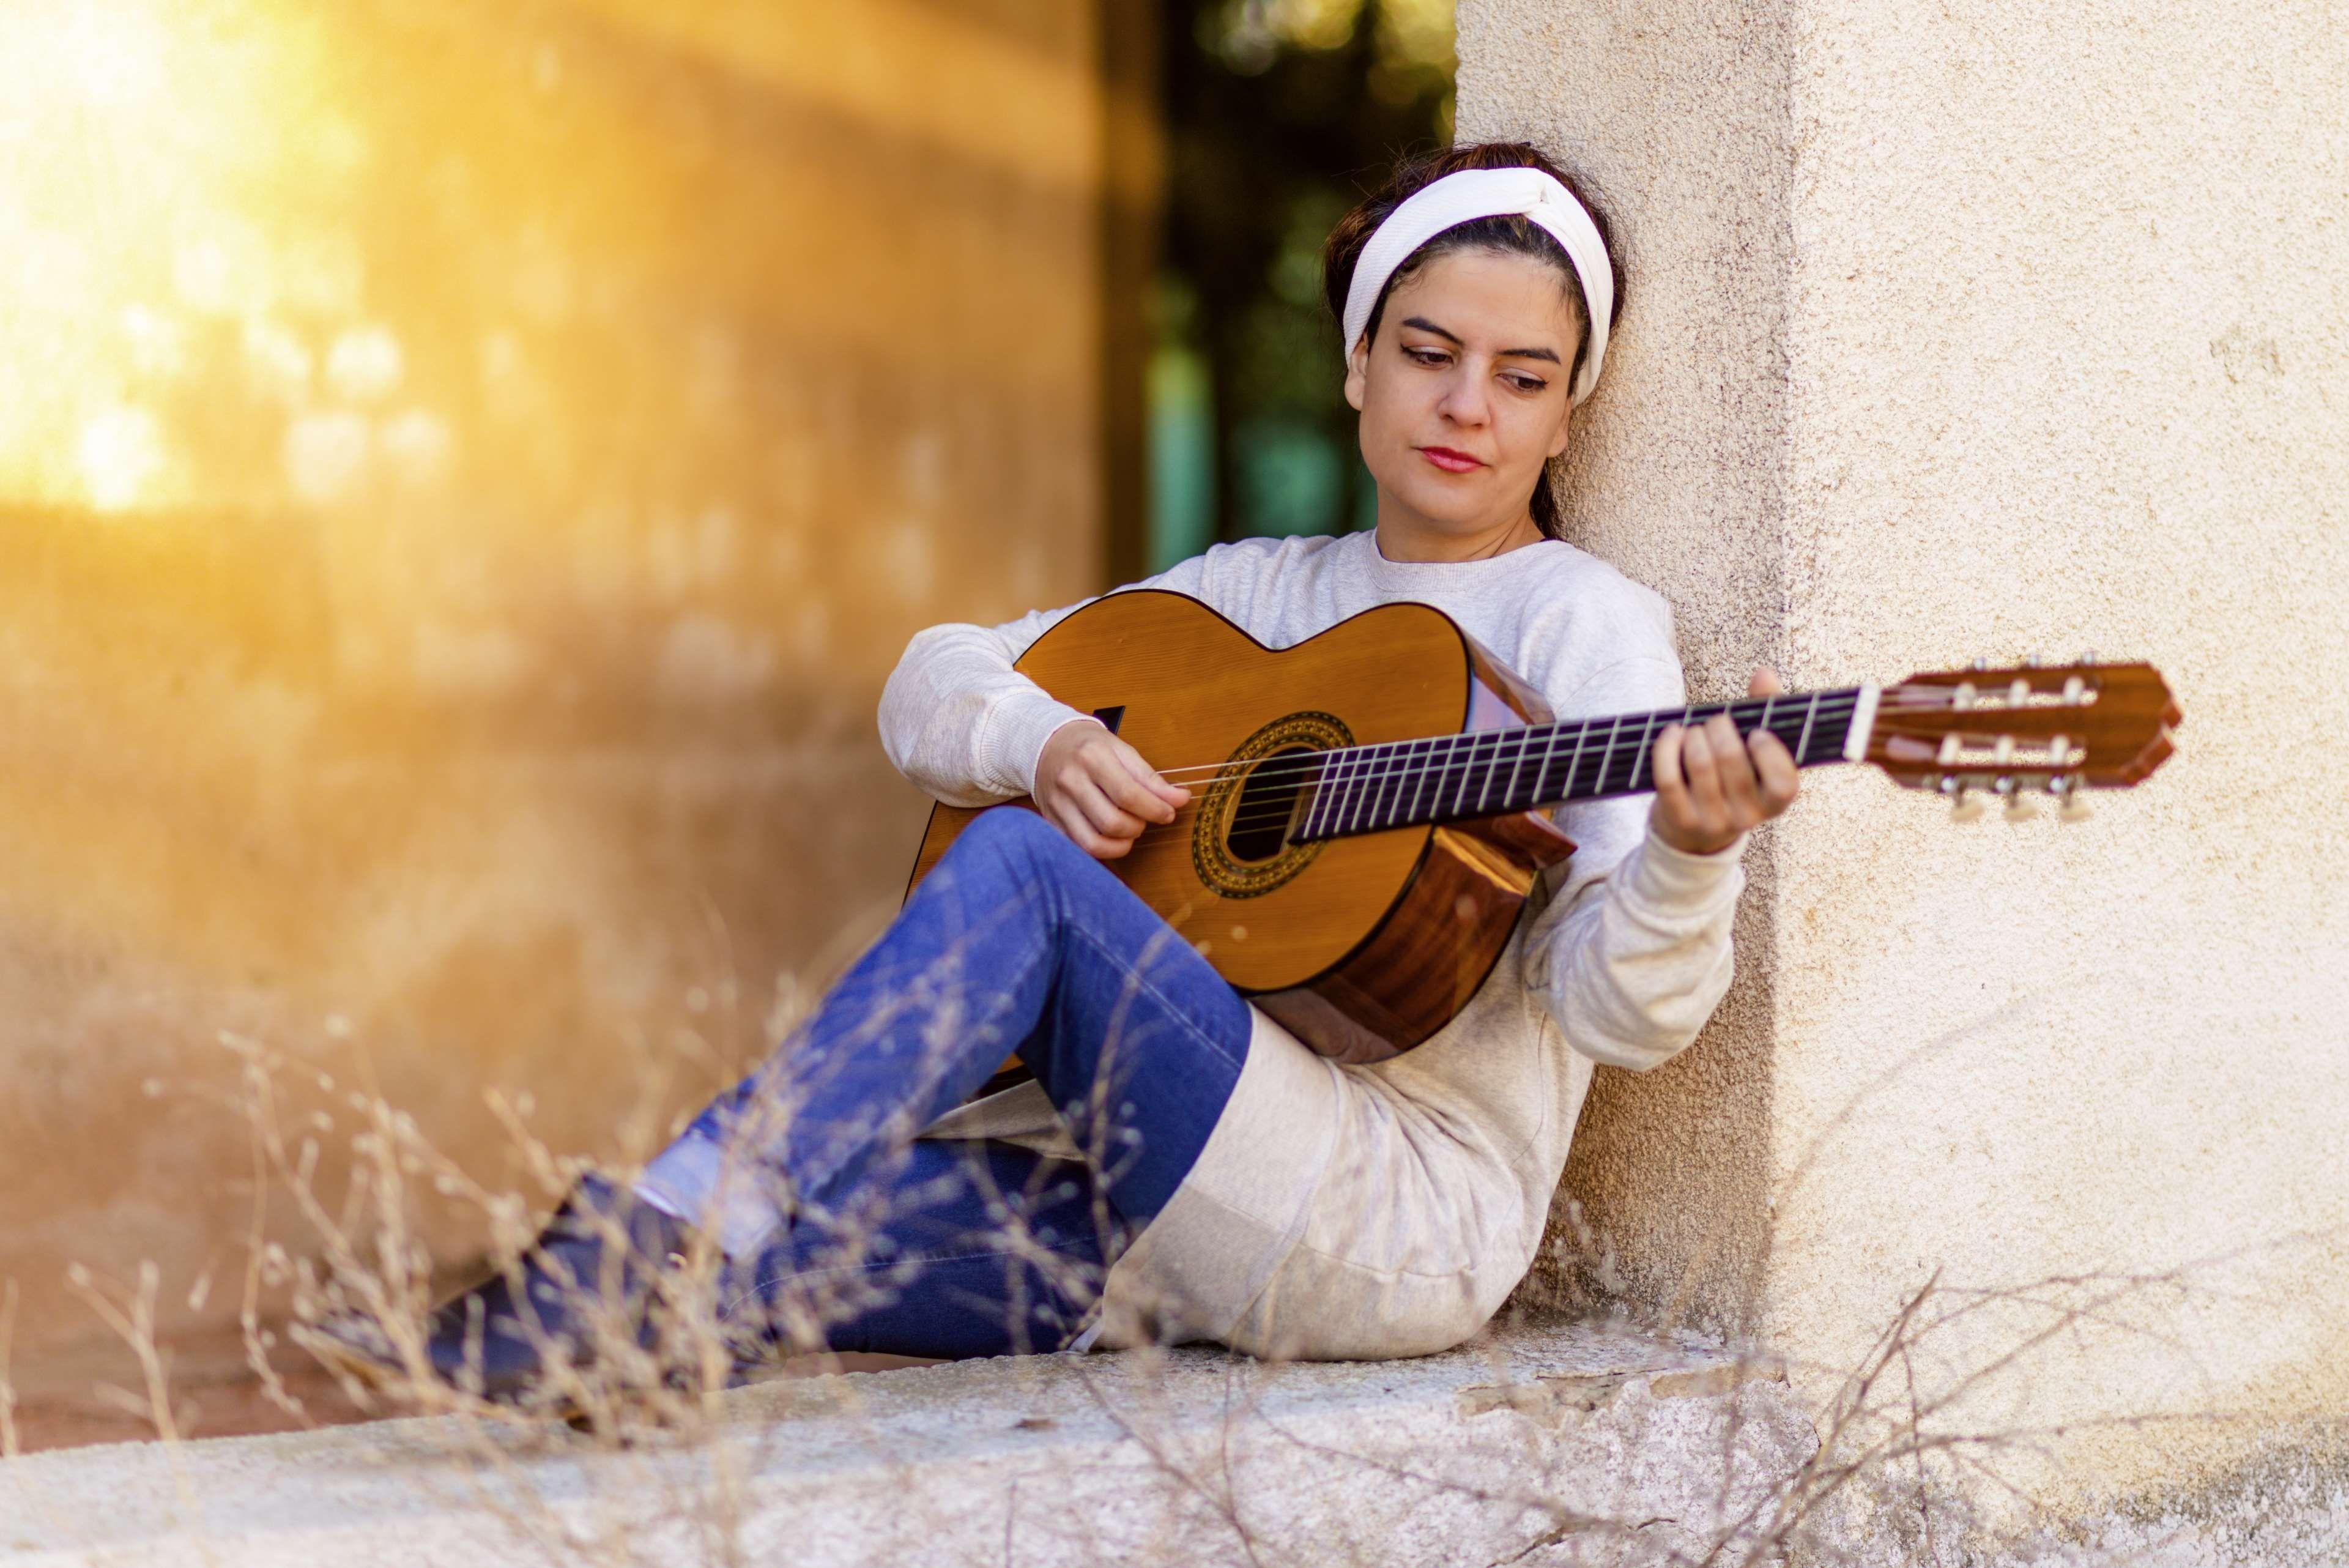 adult #beautiful #fun #girl #grass #guitar #guitarist #instrument ...